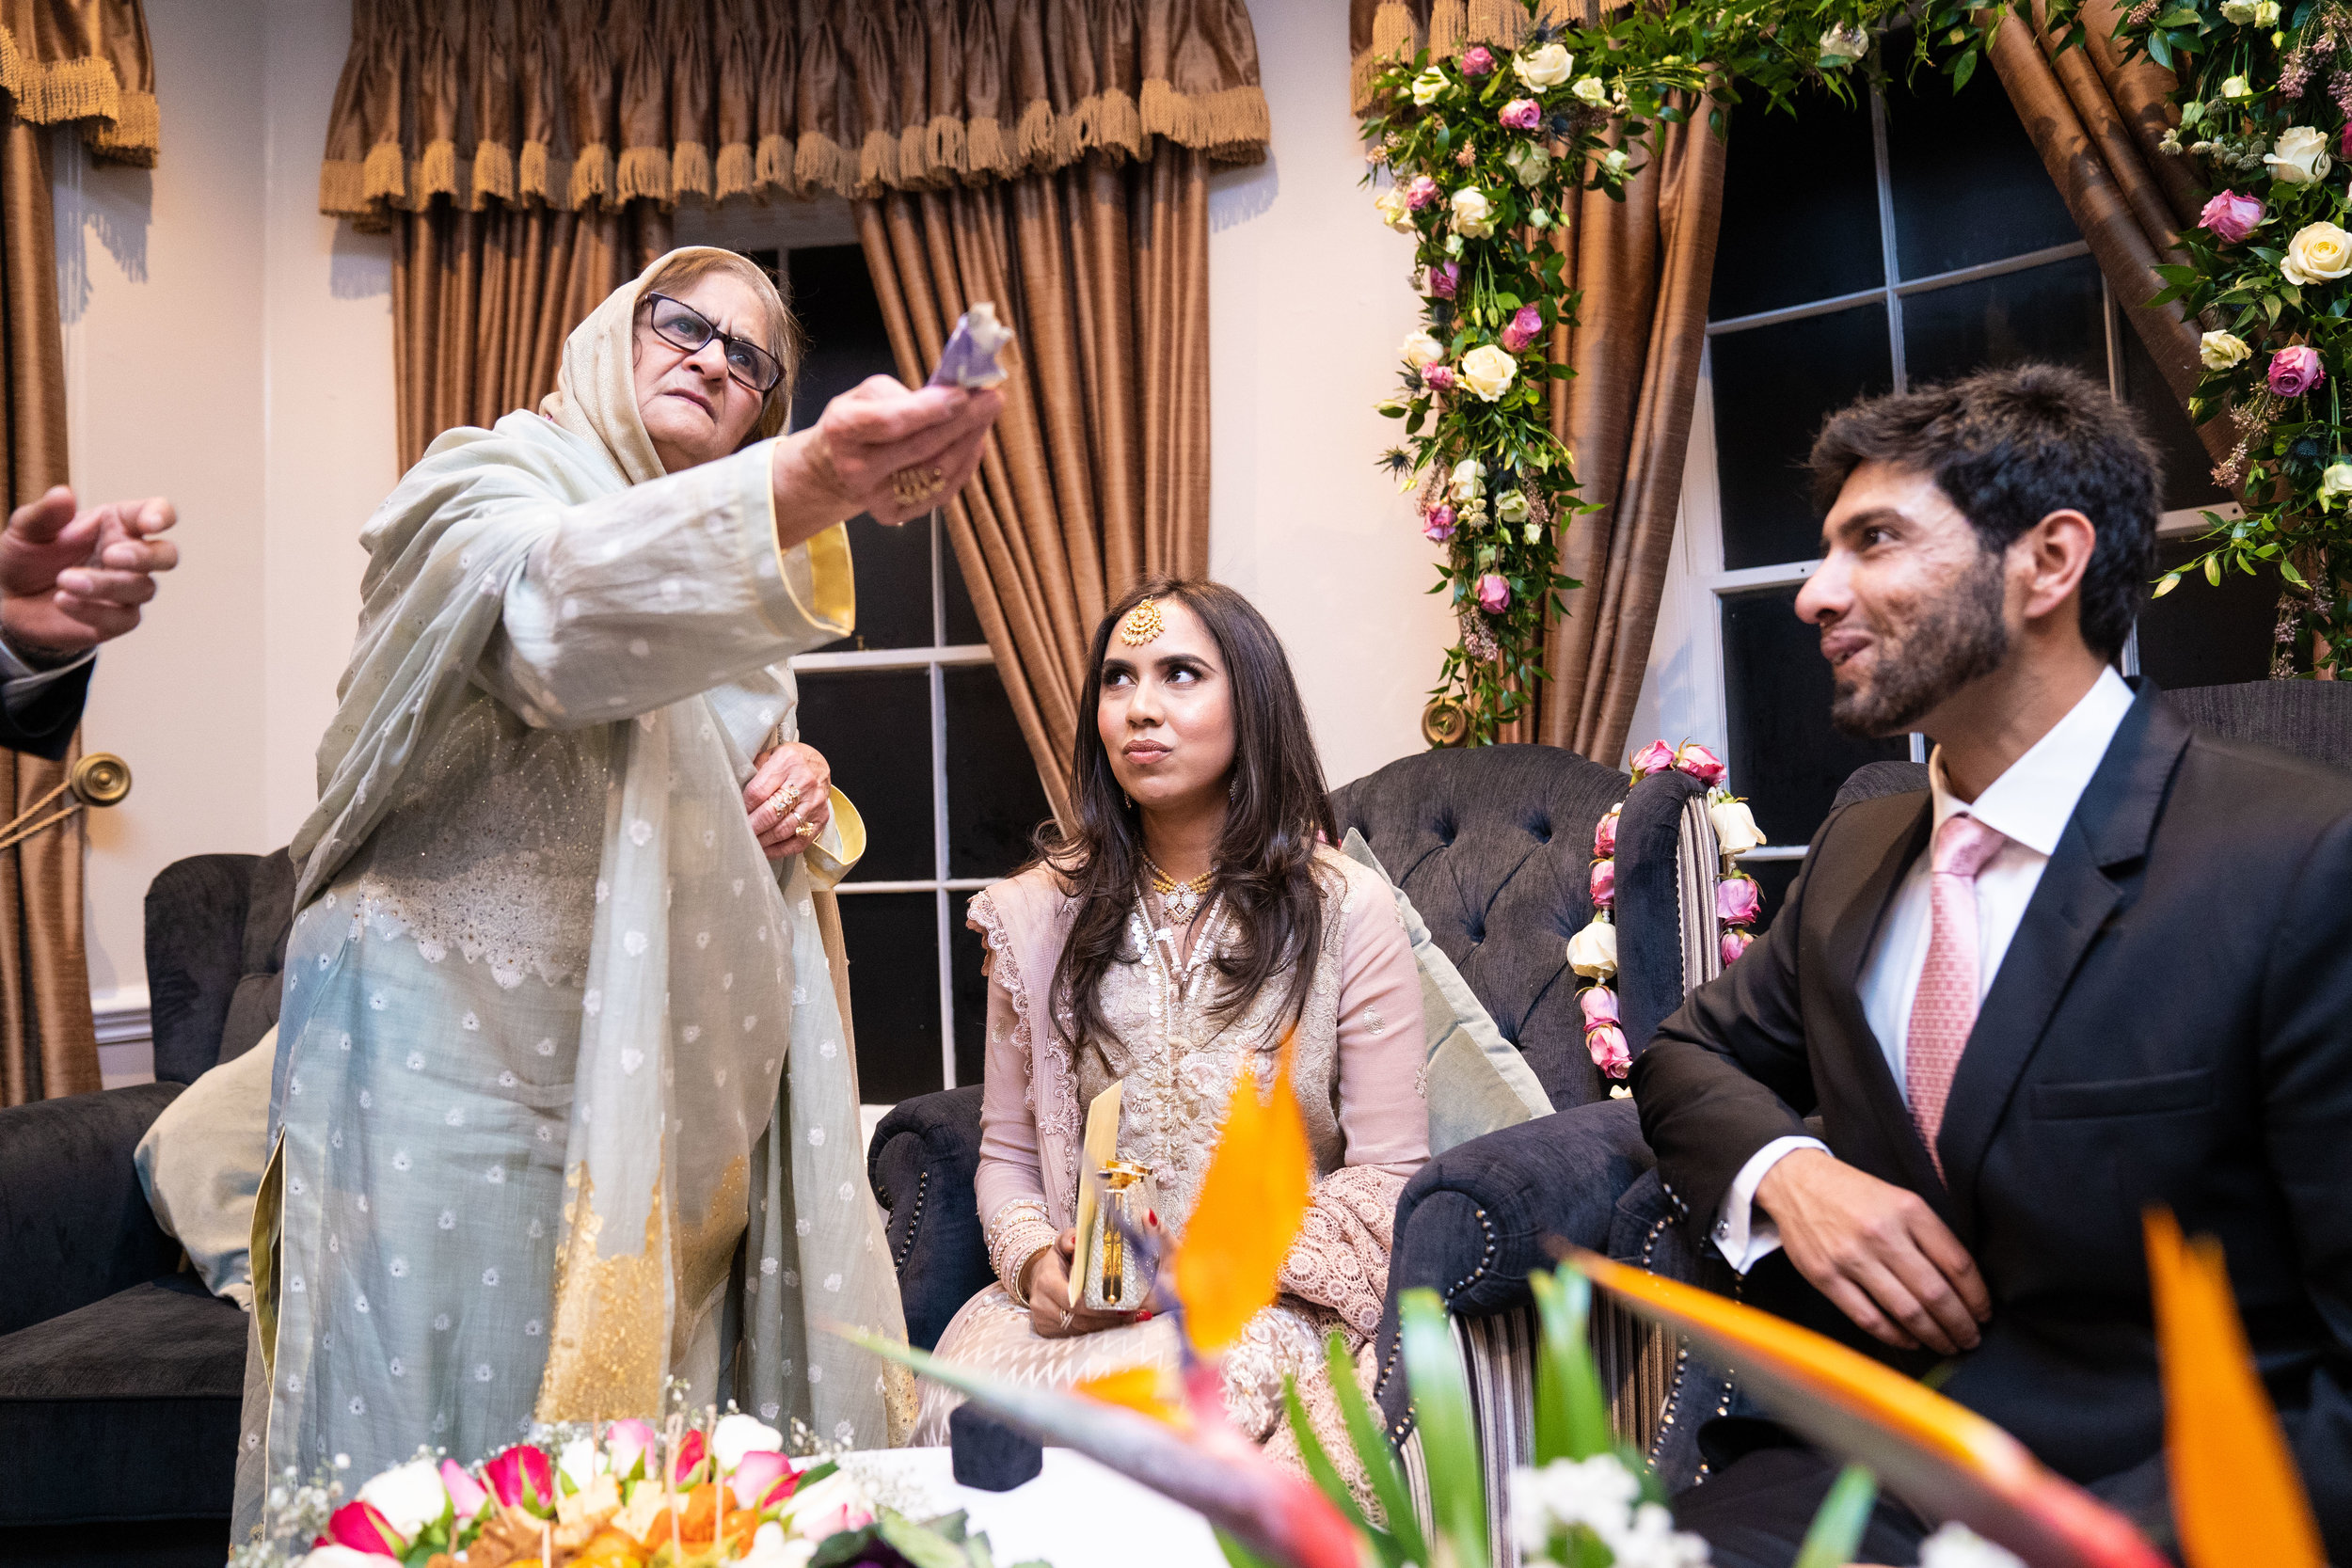 buckinghamshire-golf-club-winter-muslim-wedding-engagement-photography-videography-32